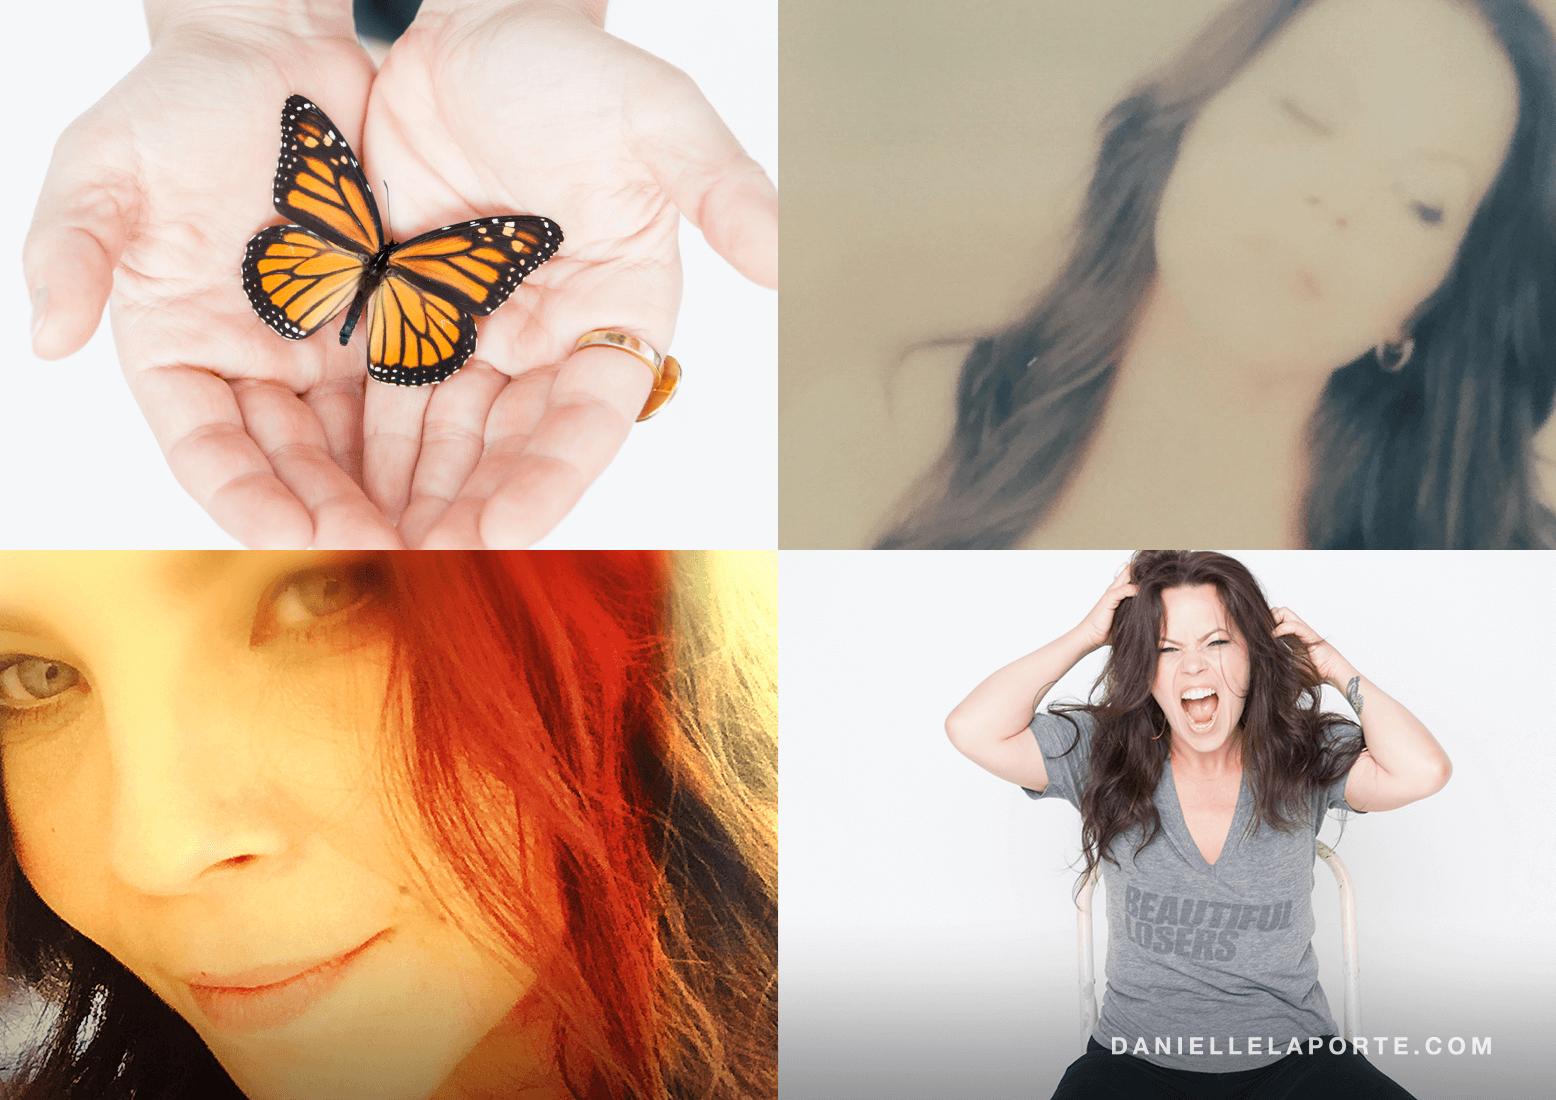 Danielle-Laporte-September-Monthly-Roundup